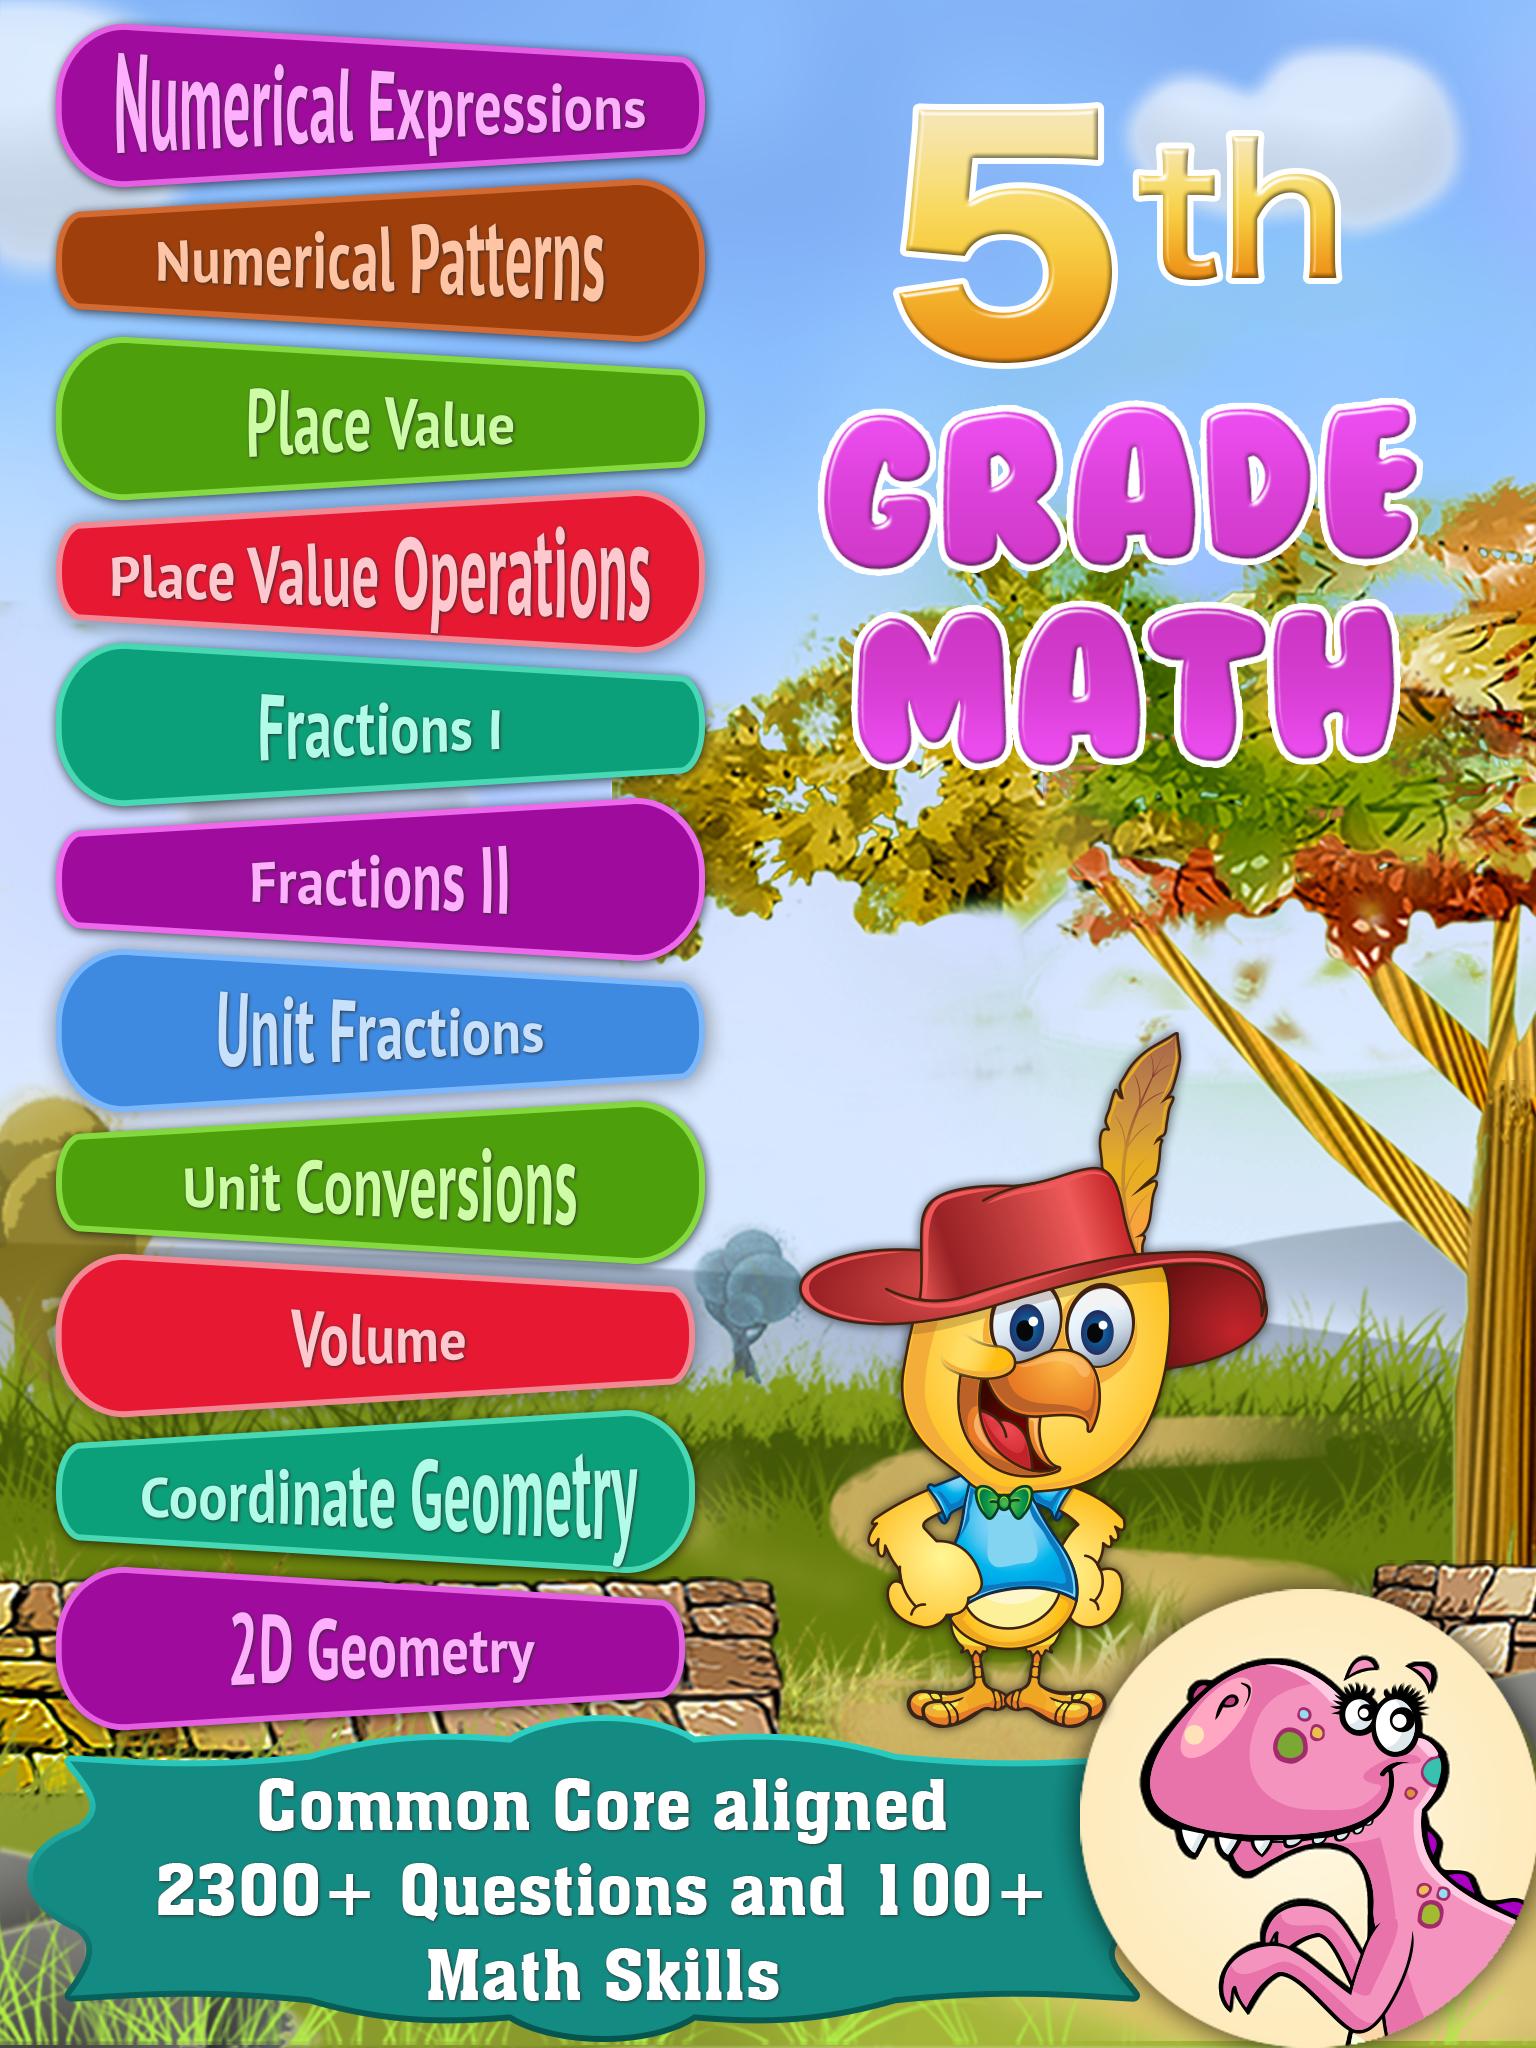 Math app for 5th Grade kids. Best math apps, Educational